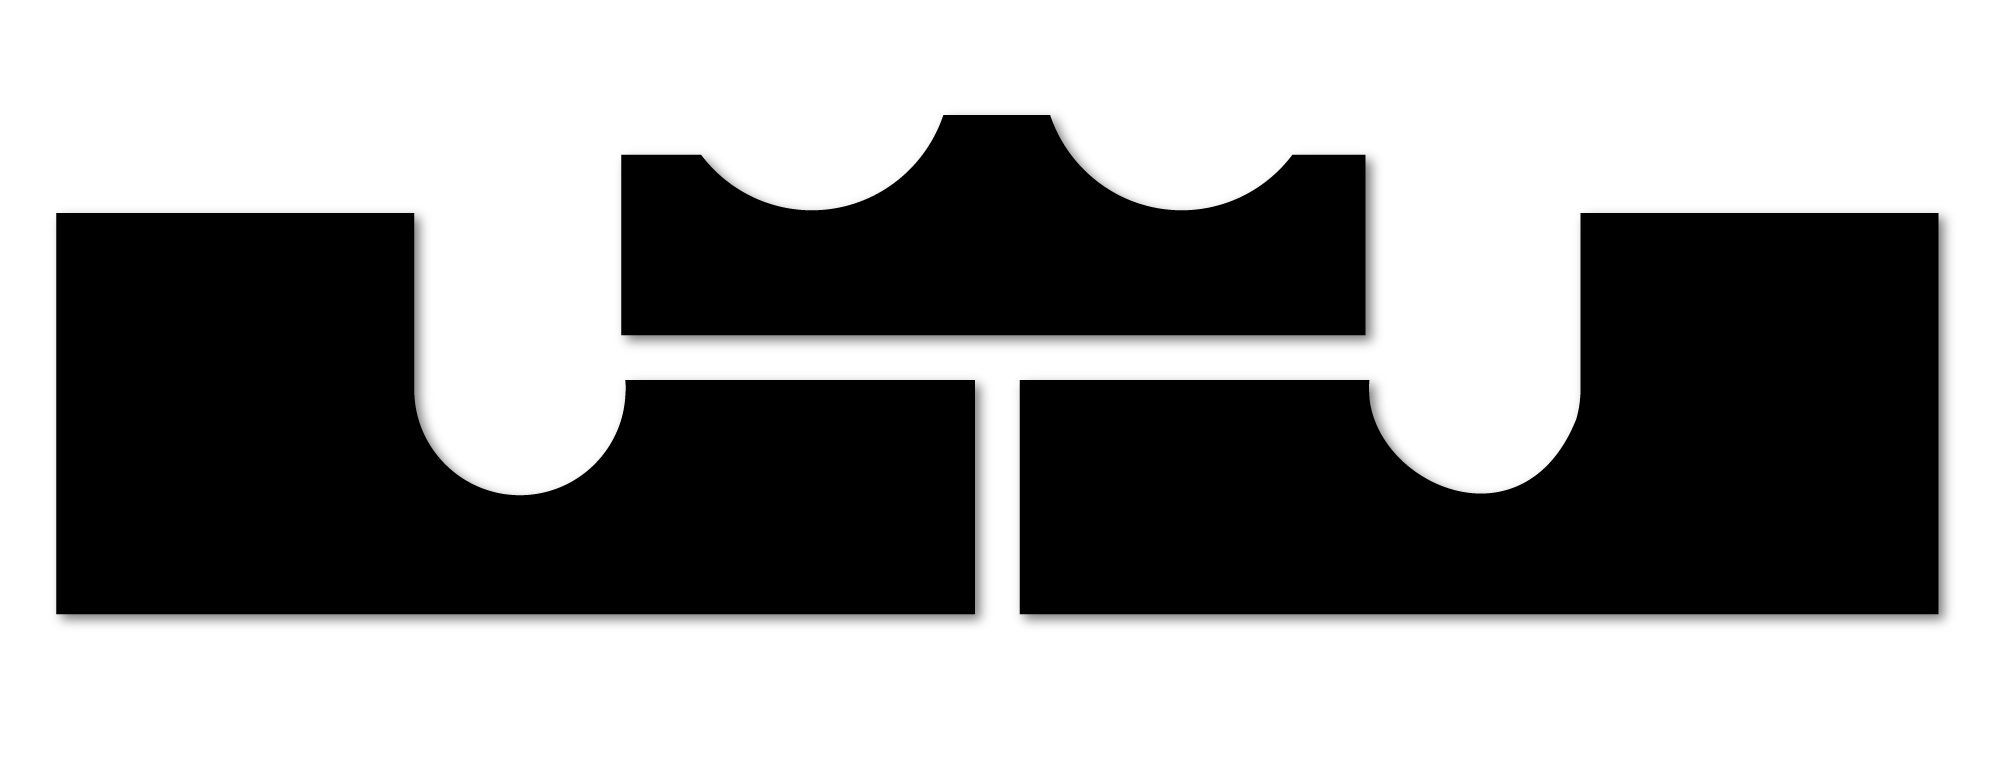 LeBron-James-emblem.jpg